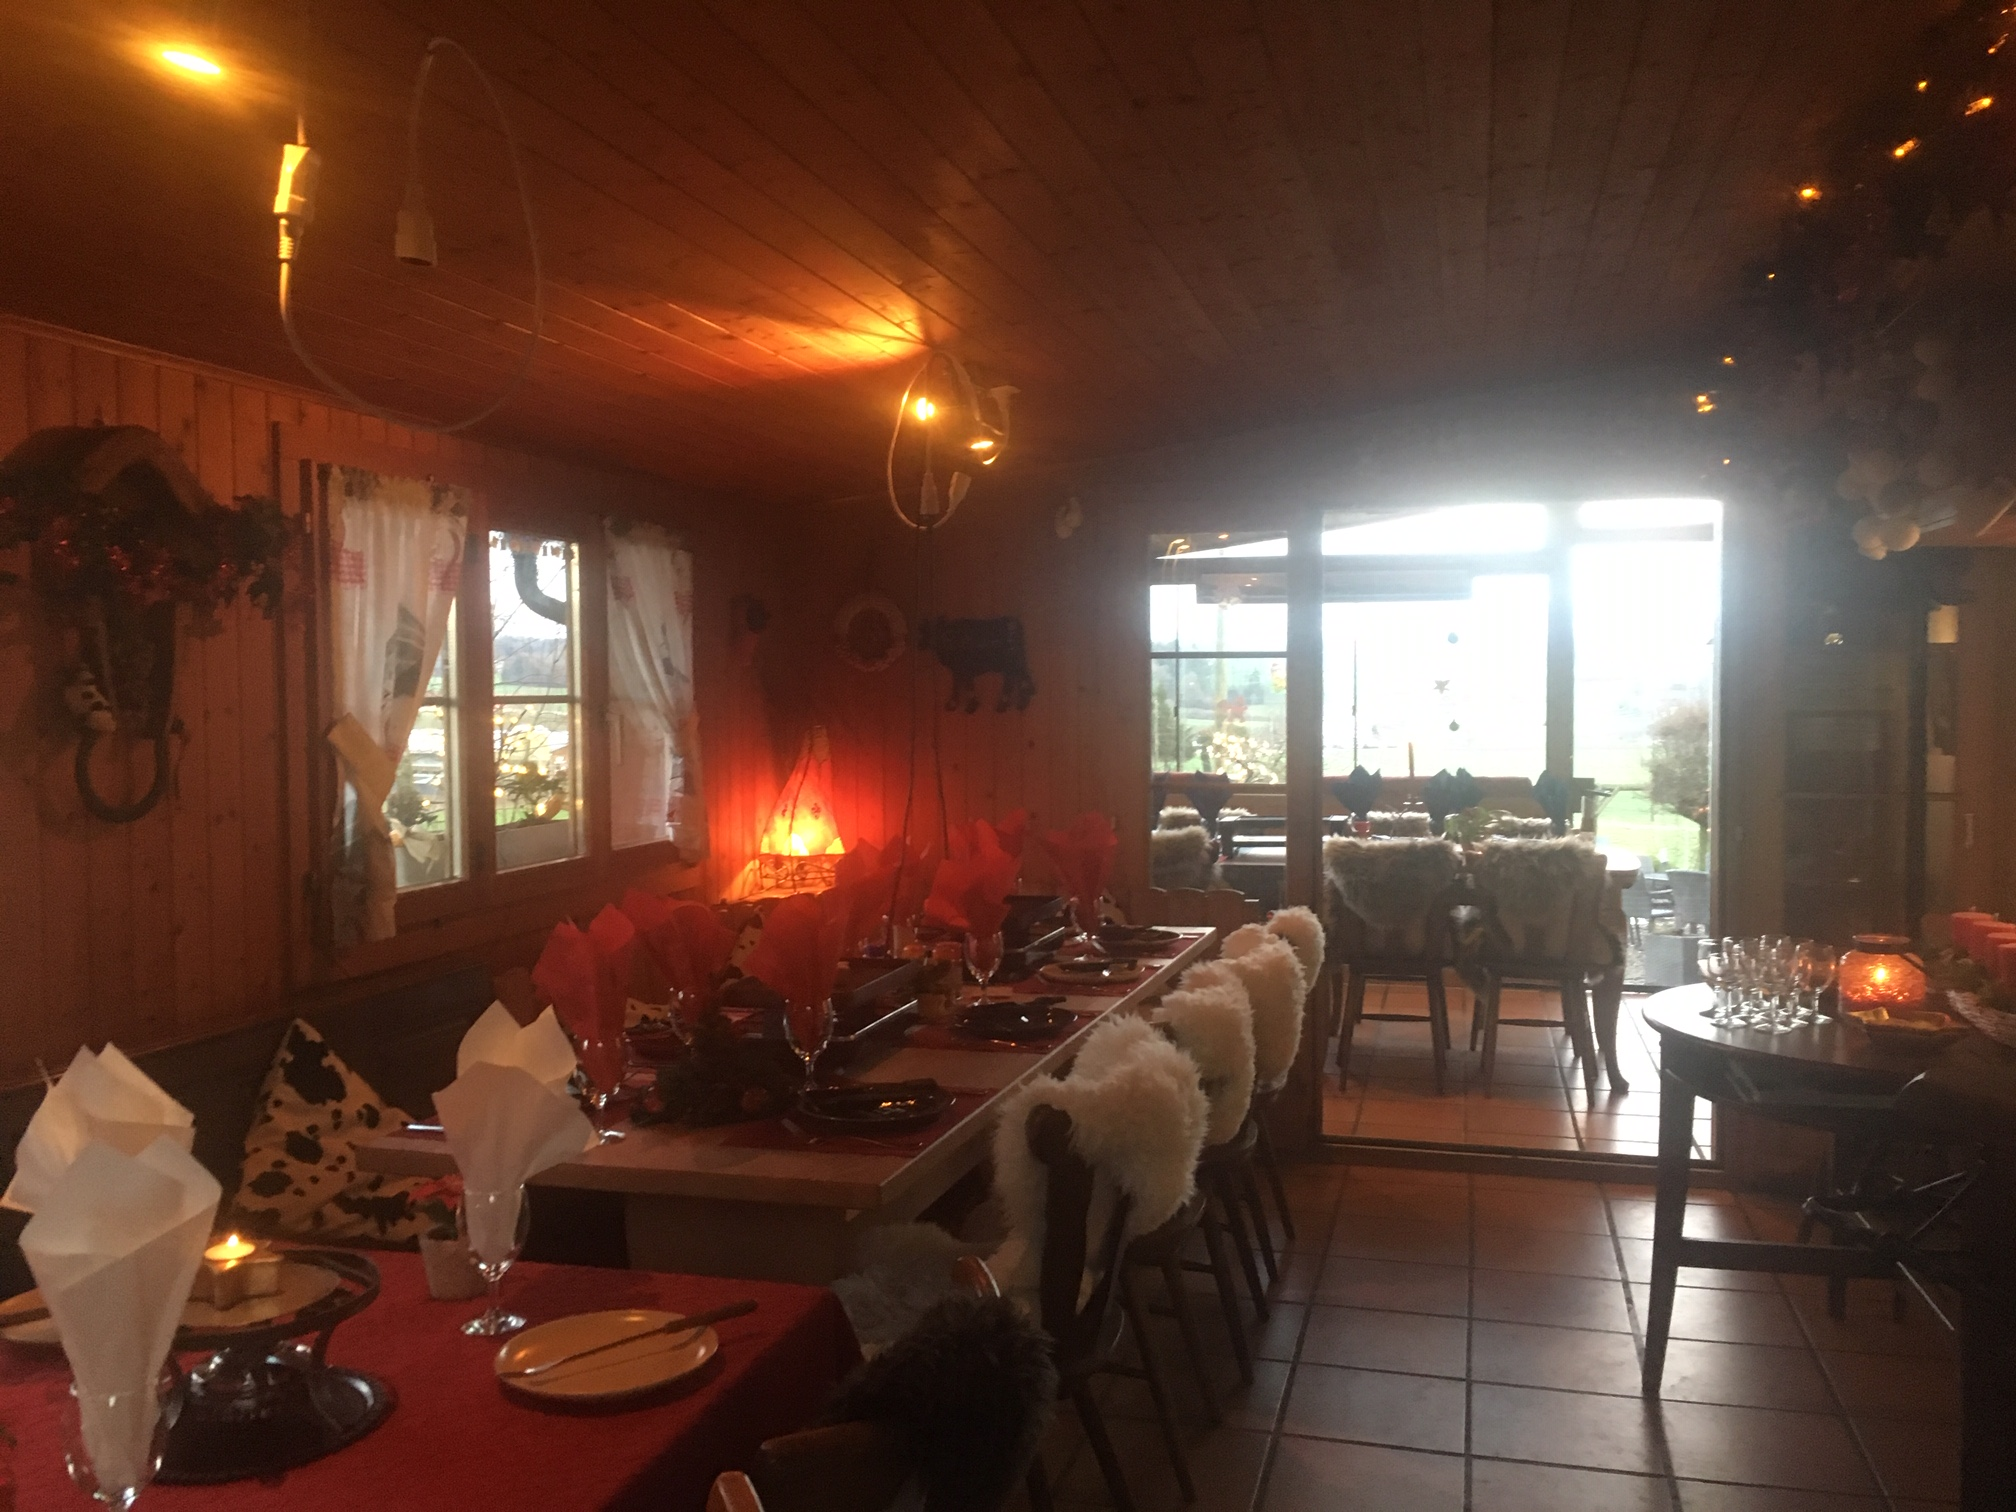 raclette, tischgrill, Brunch, Besenbeiz Rotblattstübli, Grill Spezialitäten, Grill Plausch, spiessgrill, fondue chinoise, fondue bourguignonne, fondue, Käse Fondue, Brunch auf dem Bauernhof